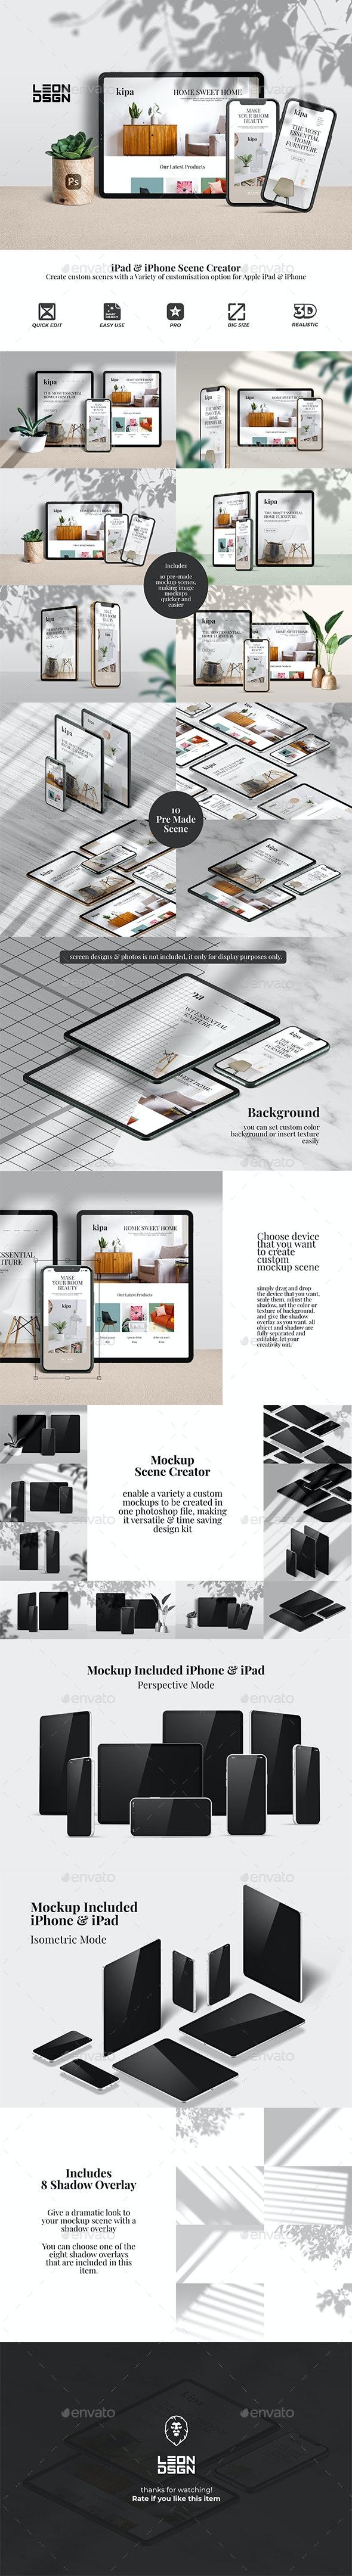 Tablet & Phone - Mockup Screen Creator - Displays Product Mock-Ups